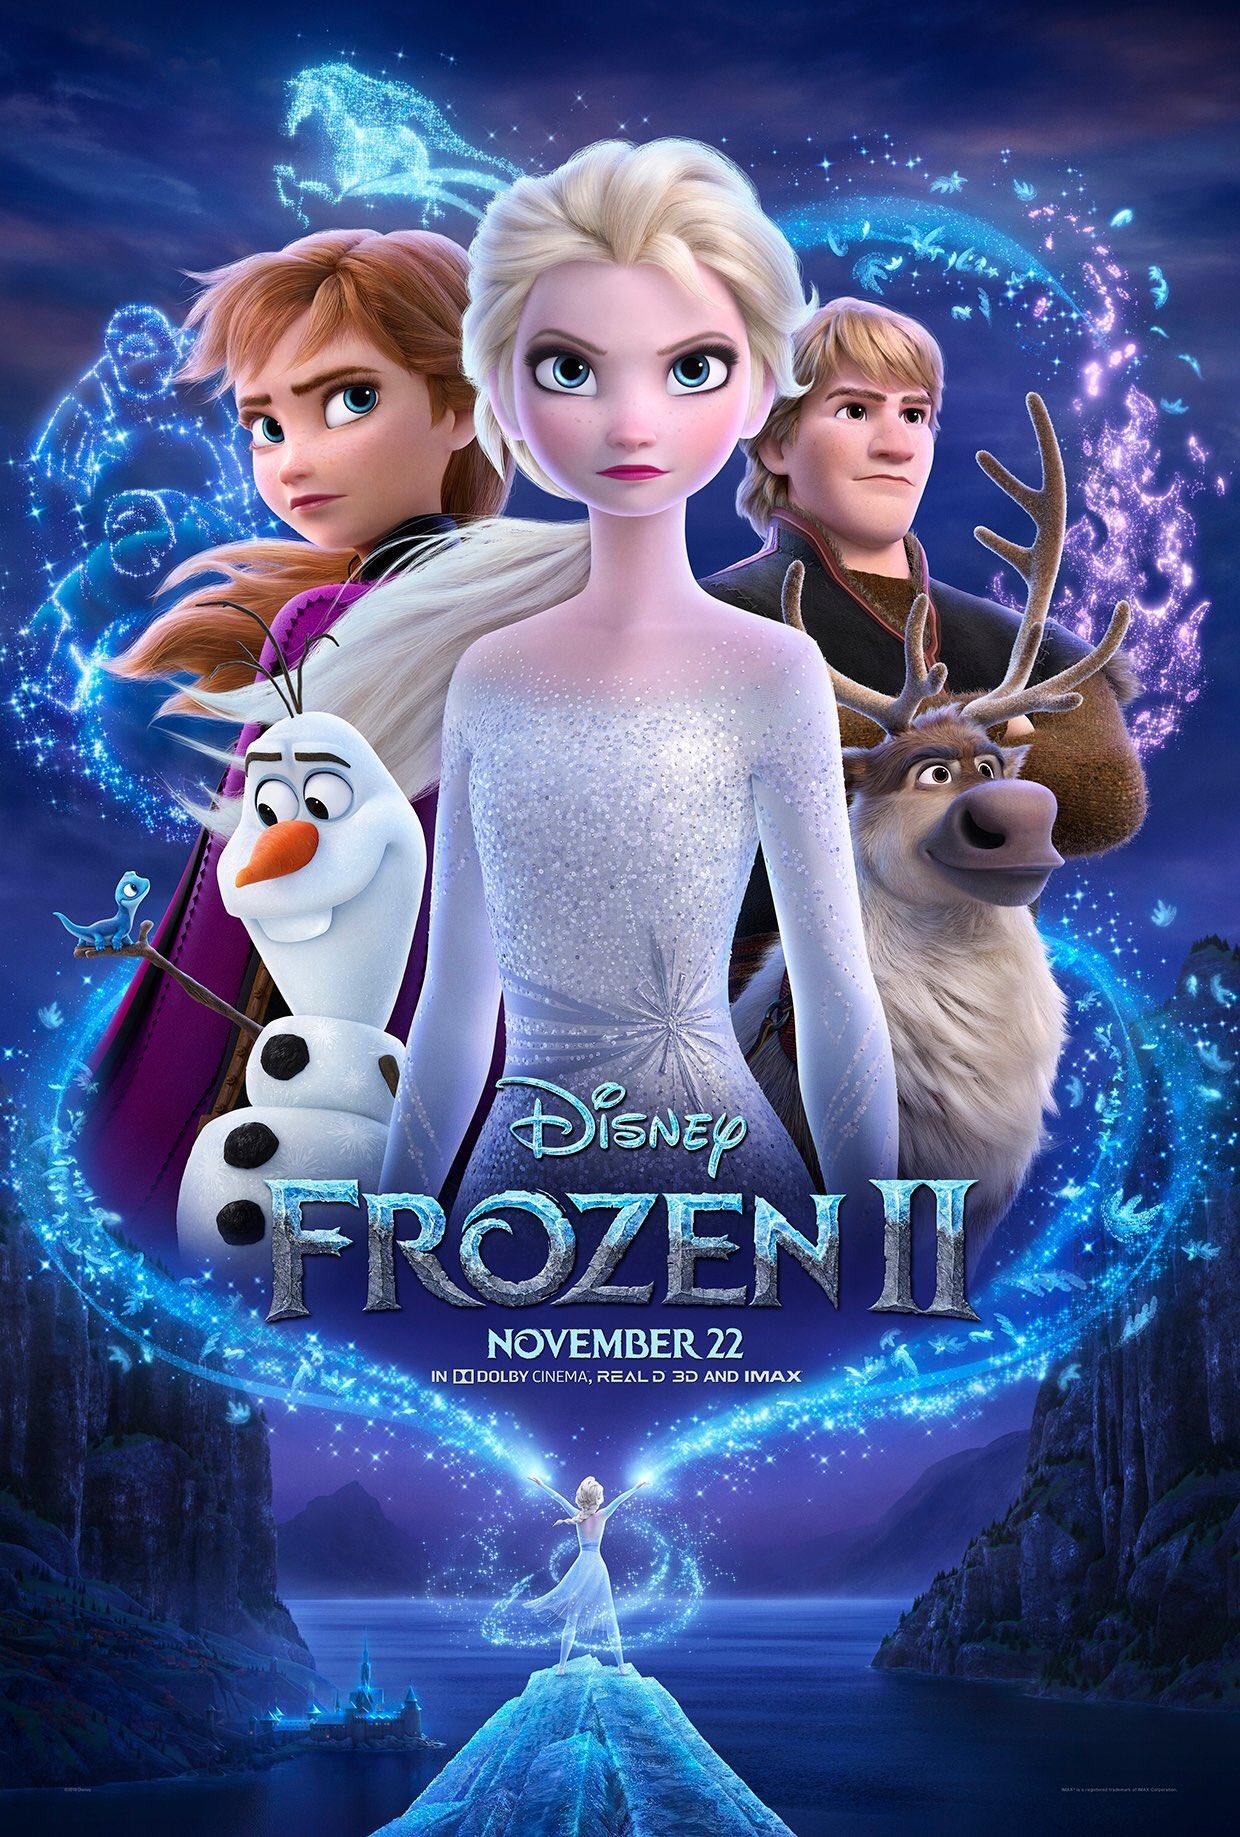 La Reine des Neiges II [Walt Disney - 2019] - Page 21 EFuCVq-WoAAlZBu?format=jpg&name=large